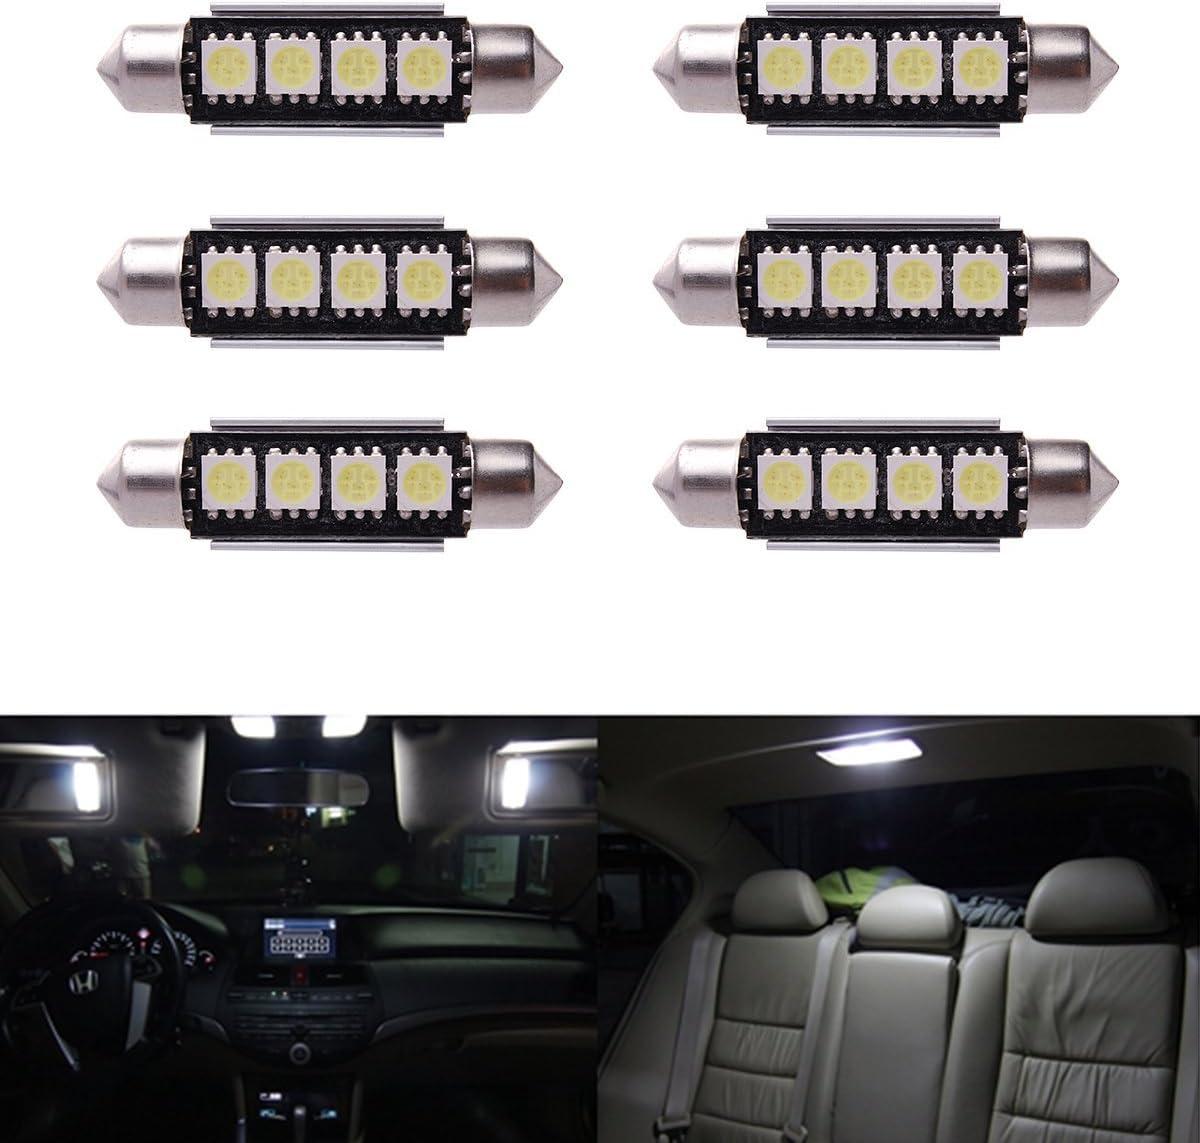 XCSOURCE 6 x Car Dome 5050 SMD LED Canbus Bombilla Interior del Adorno LED 42MM Blanco LD308